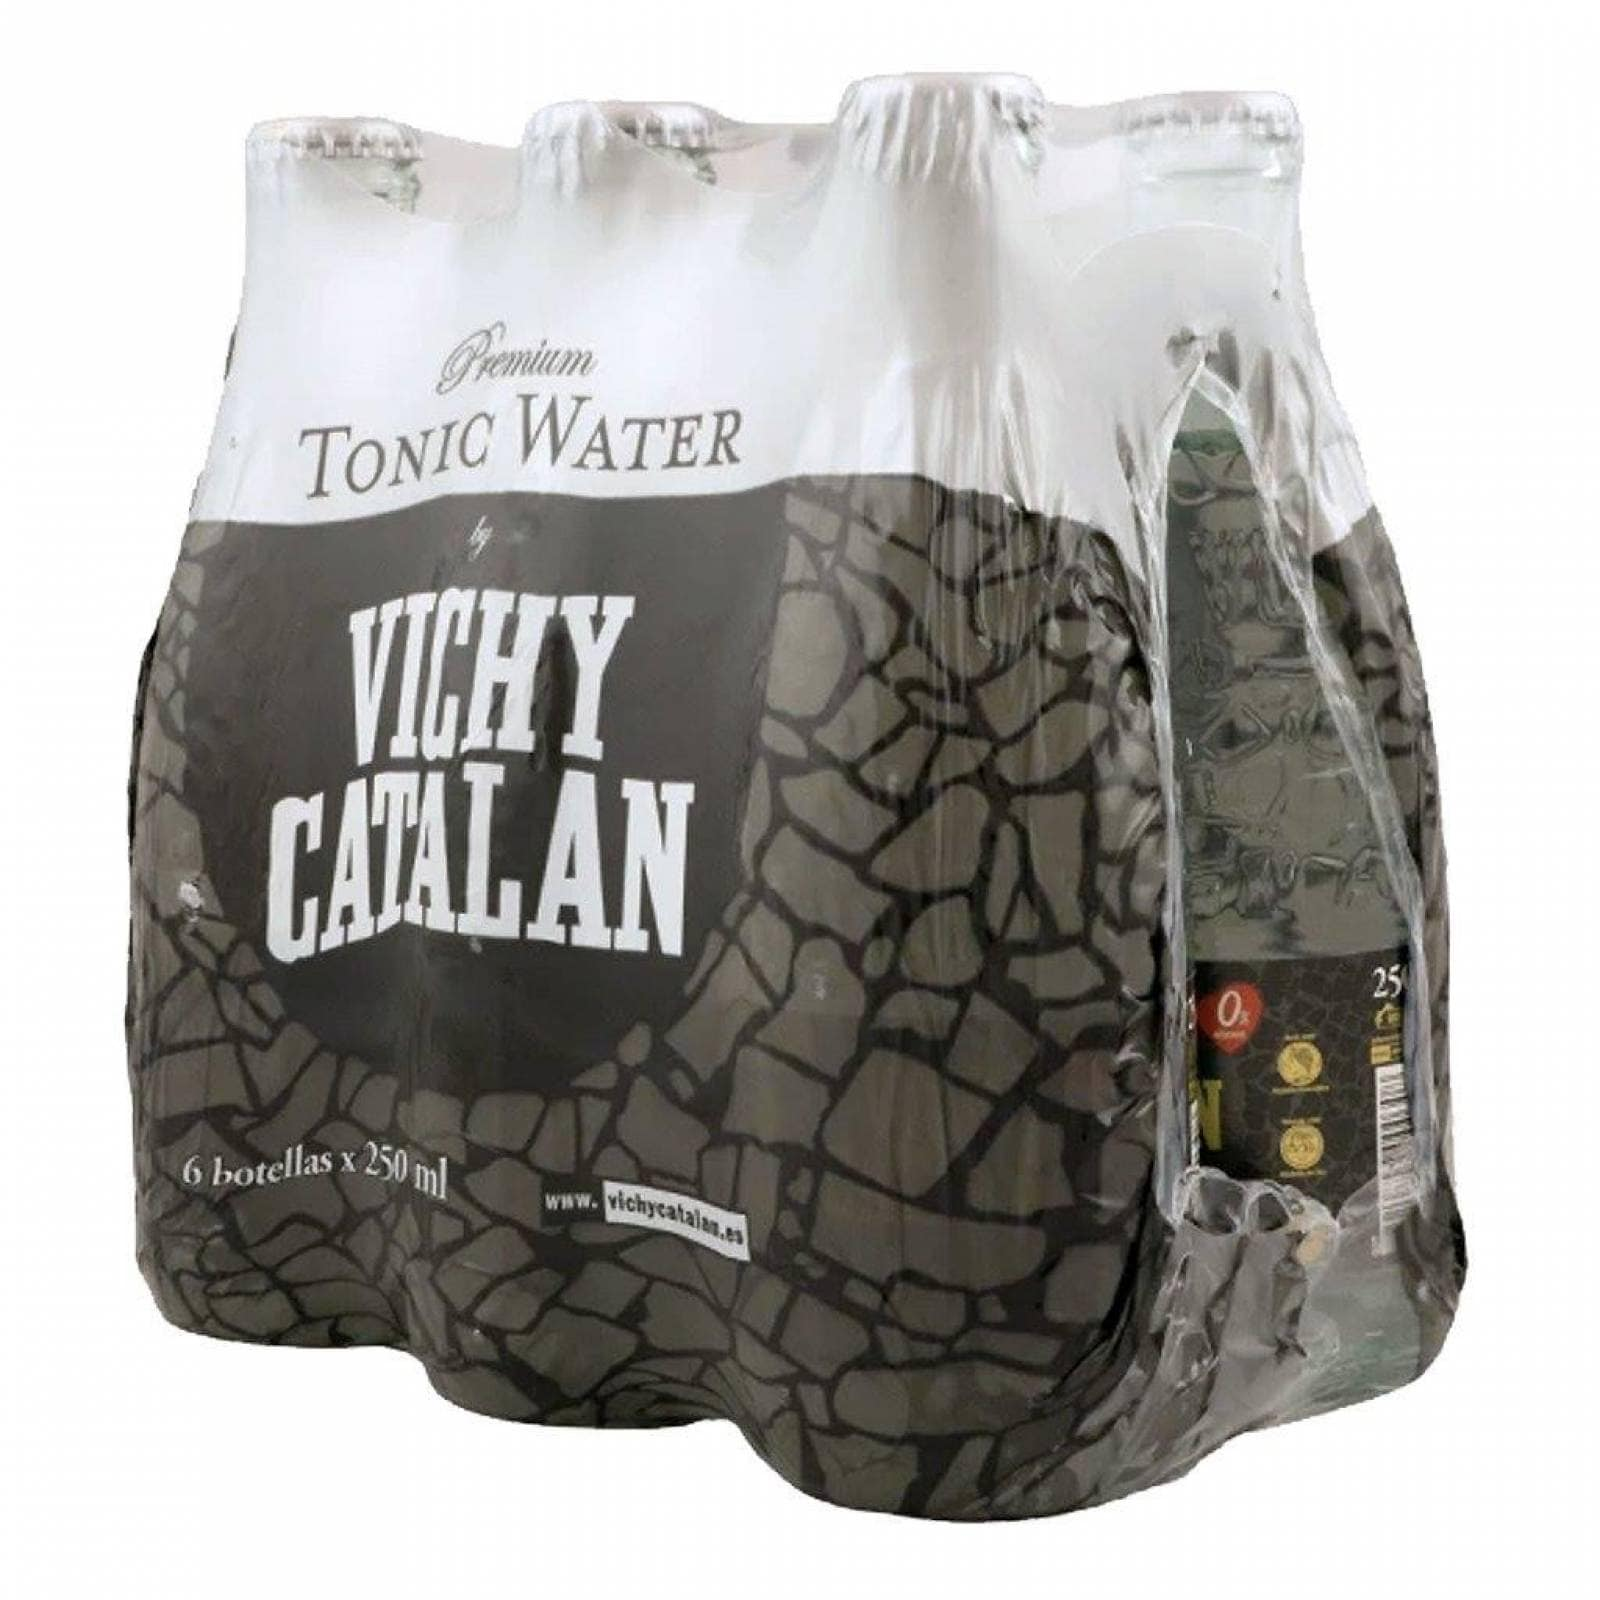 Vichy Catalan Agua mineral tonica 6 botellas de 250 ml